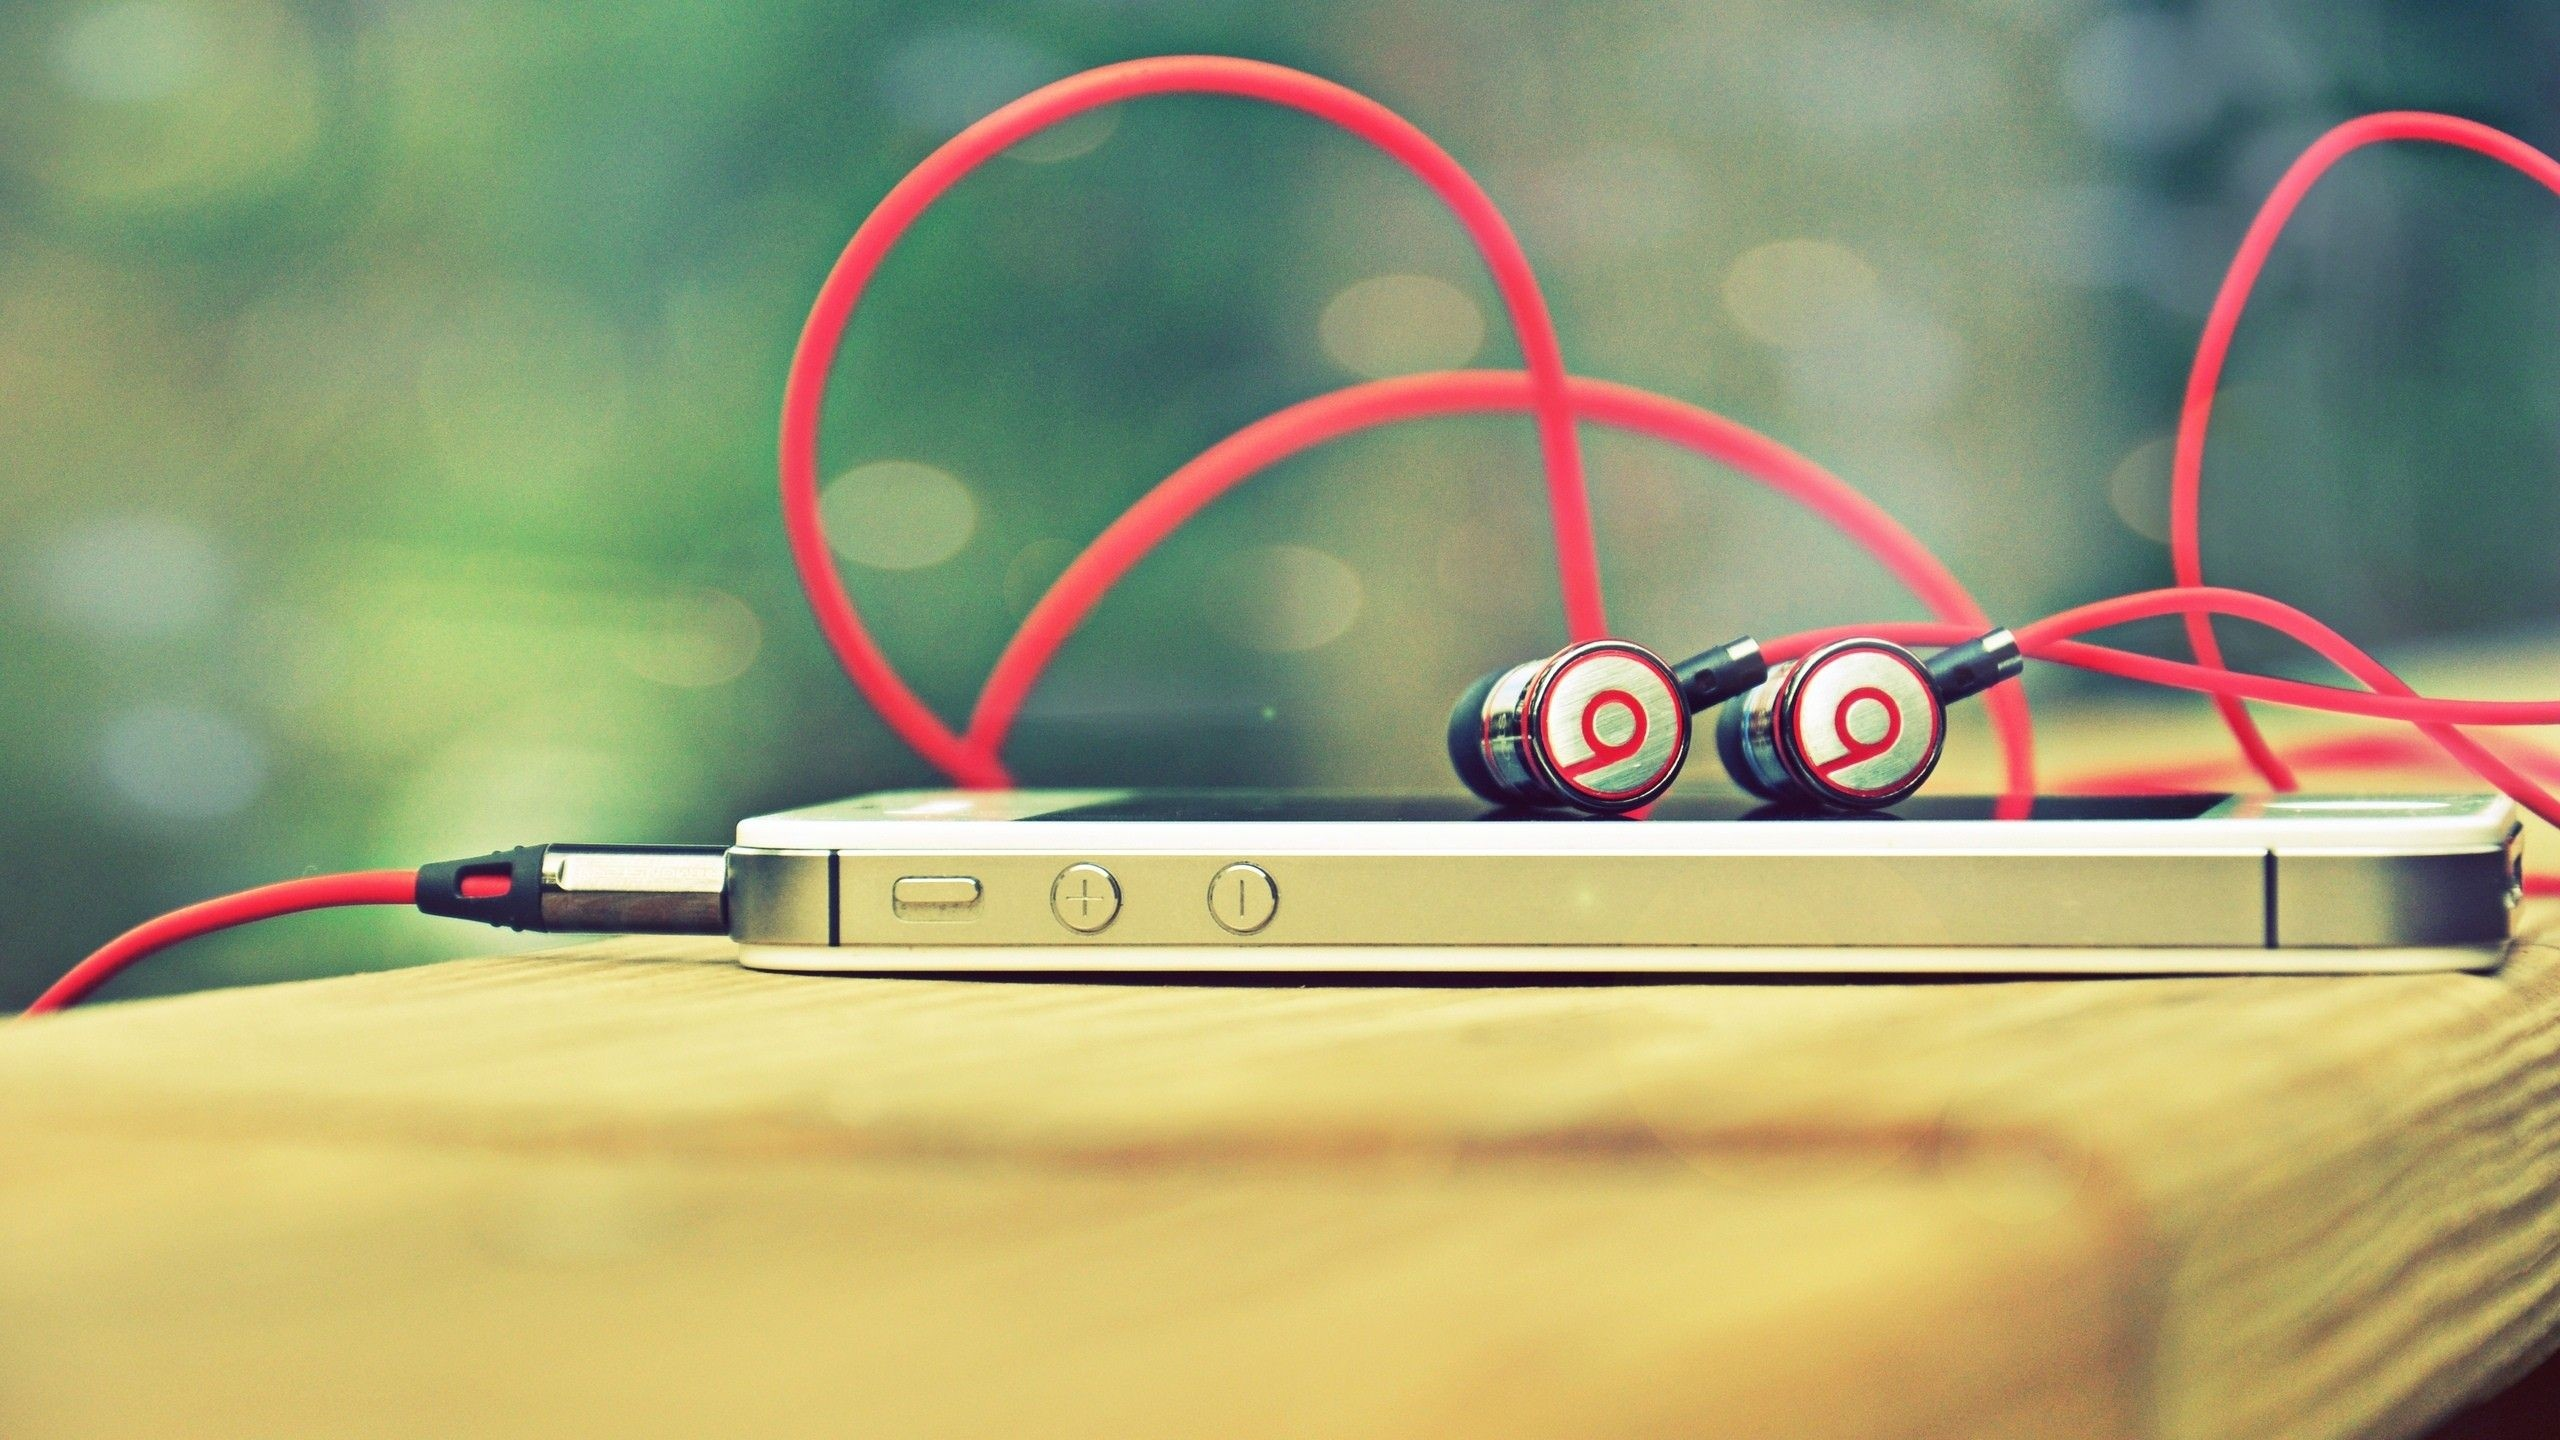 Preview wallpaper monster beats, apple, iphone, headphones, phone 2560×1440